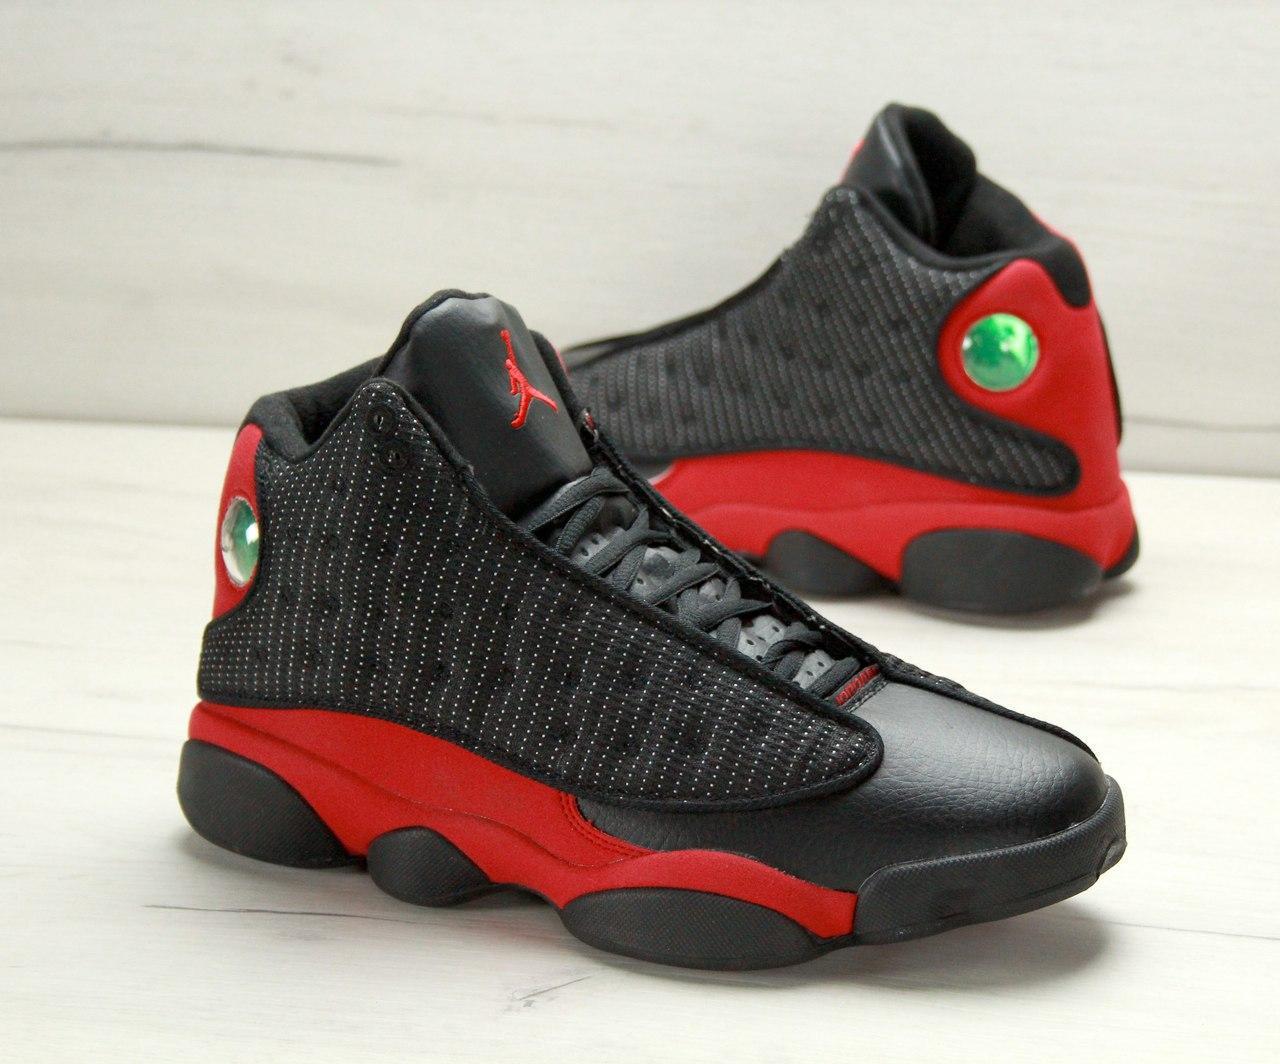 2b34d928 Мужские кроссовки Nike Air Jordan 13